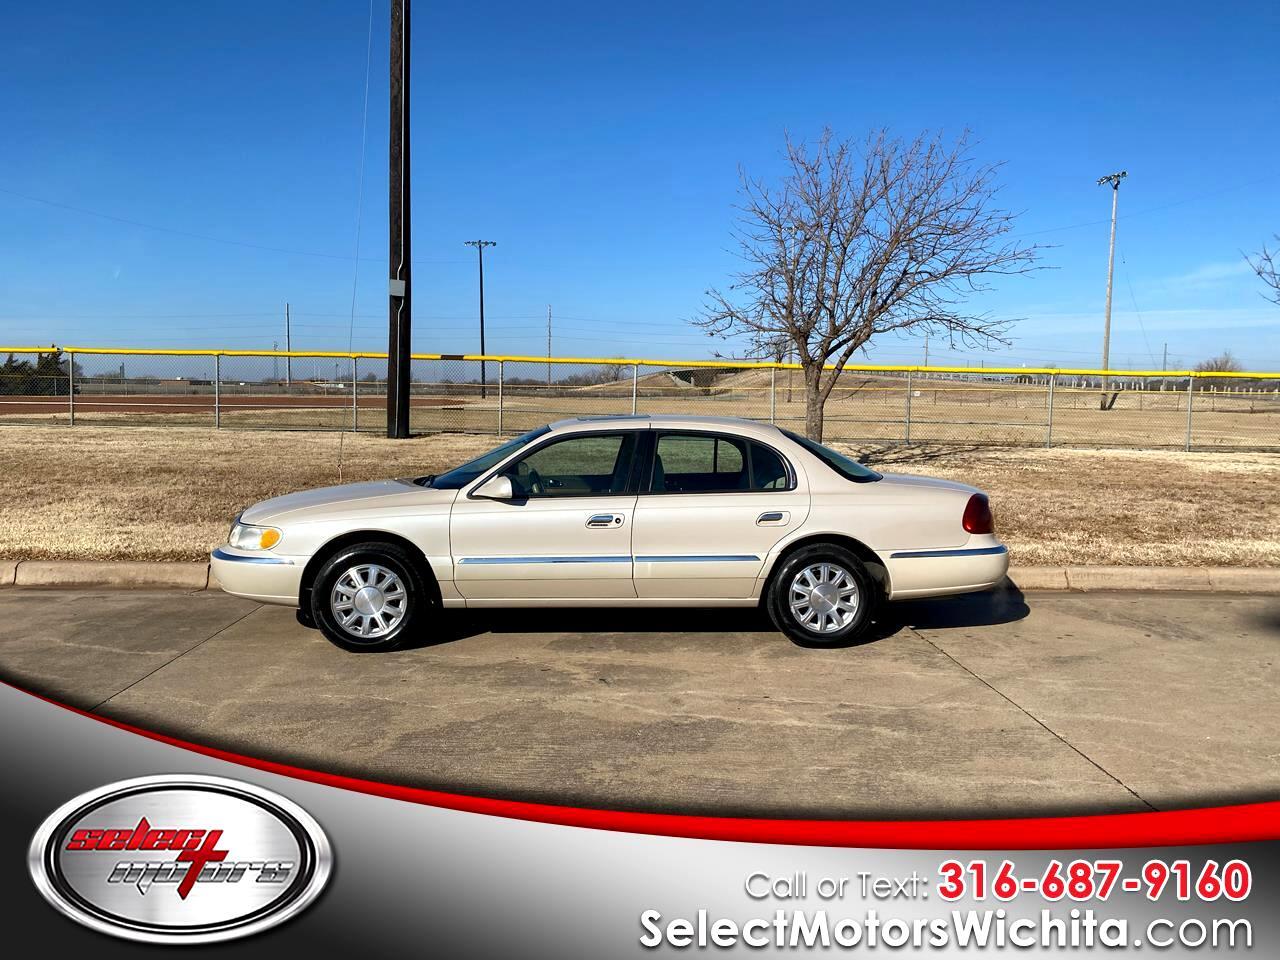 Lincoln Continental 4dr Sdn 2001